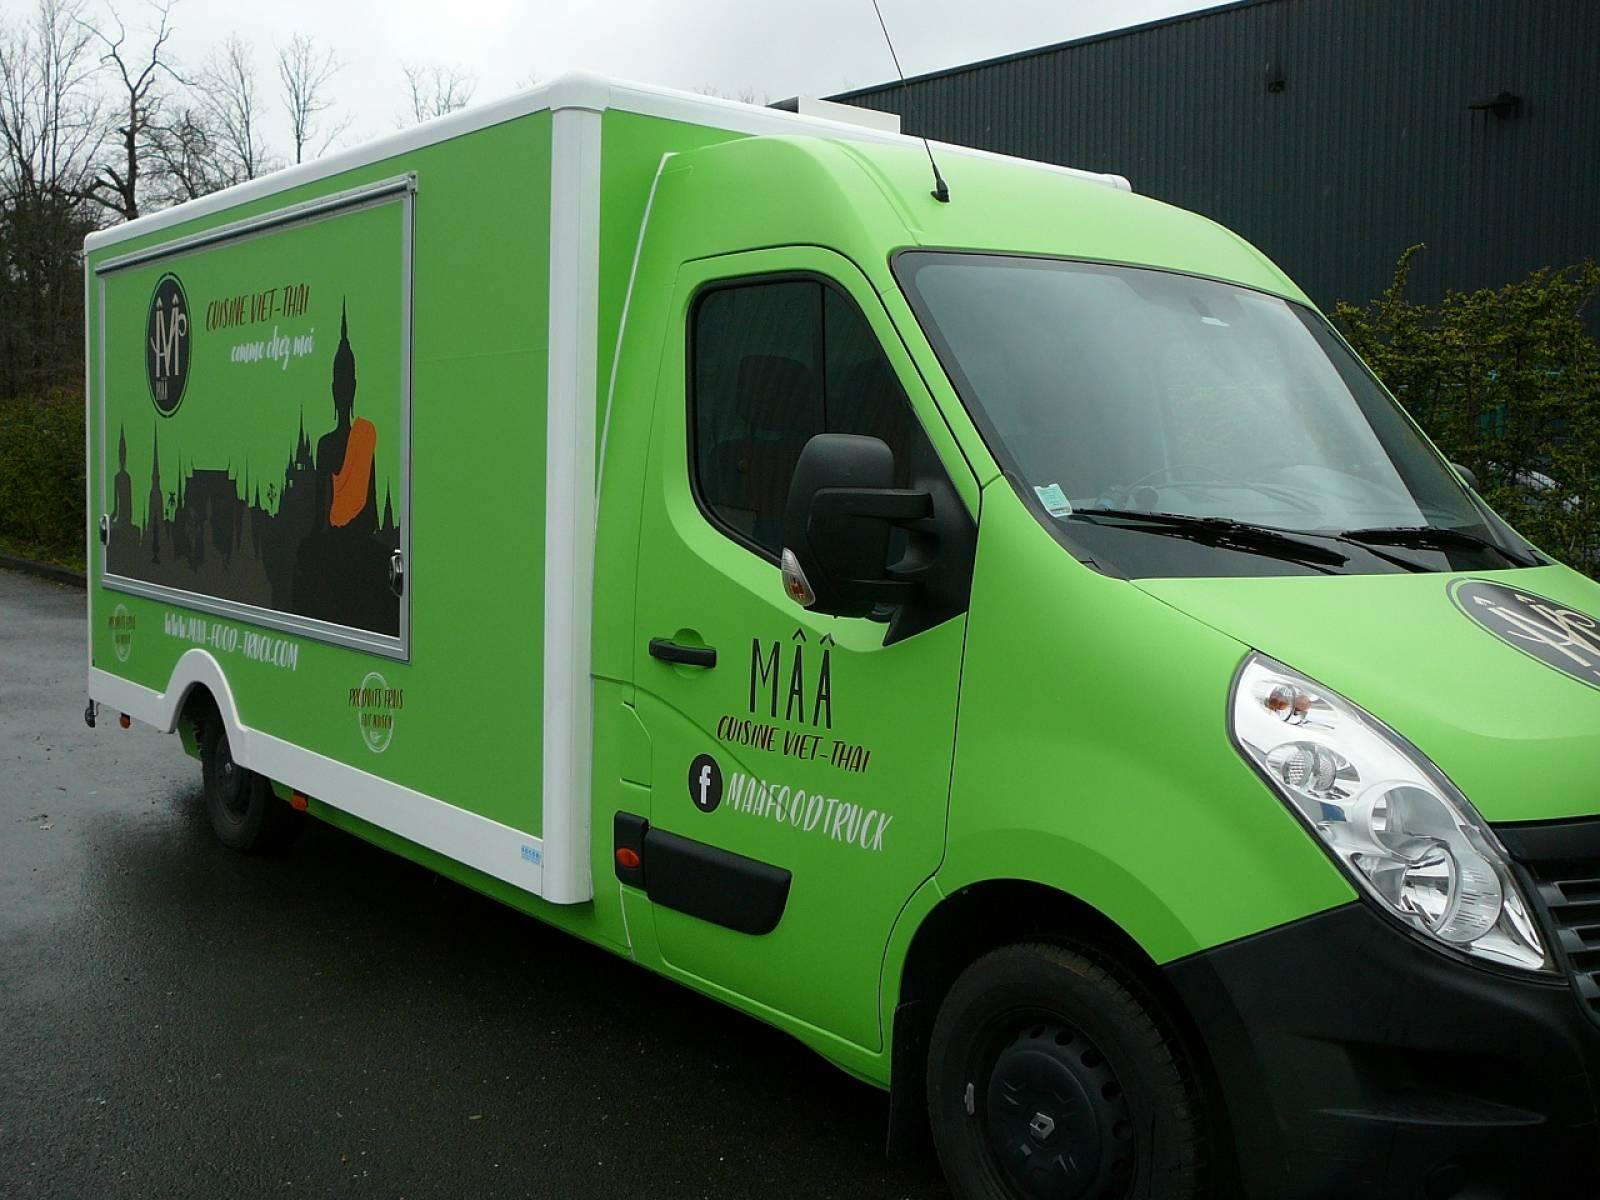 camion magasin food truck bordeaux creation de camion magasin et foodtruck sur mesure. Black Bedroom Furniture Sets. Home Design Ideas